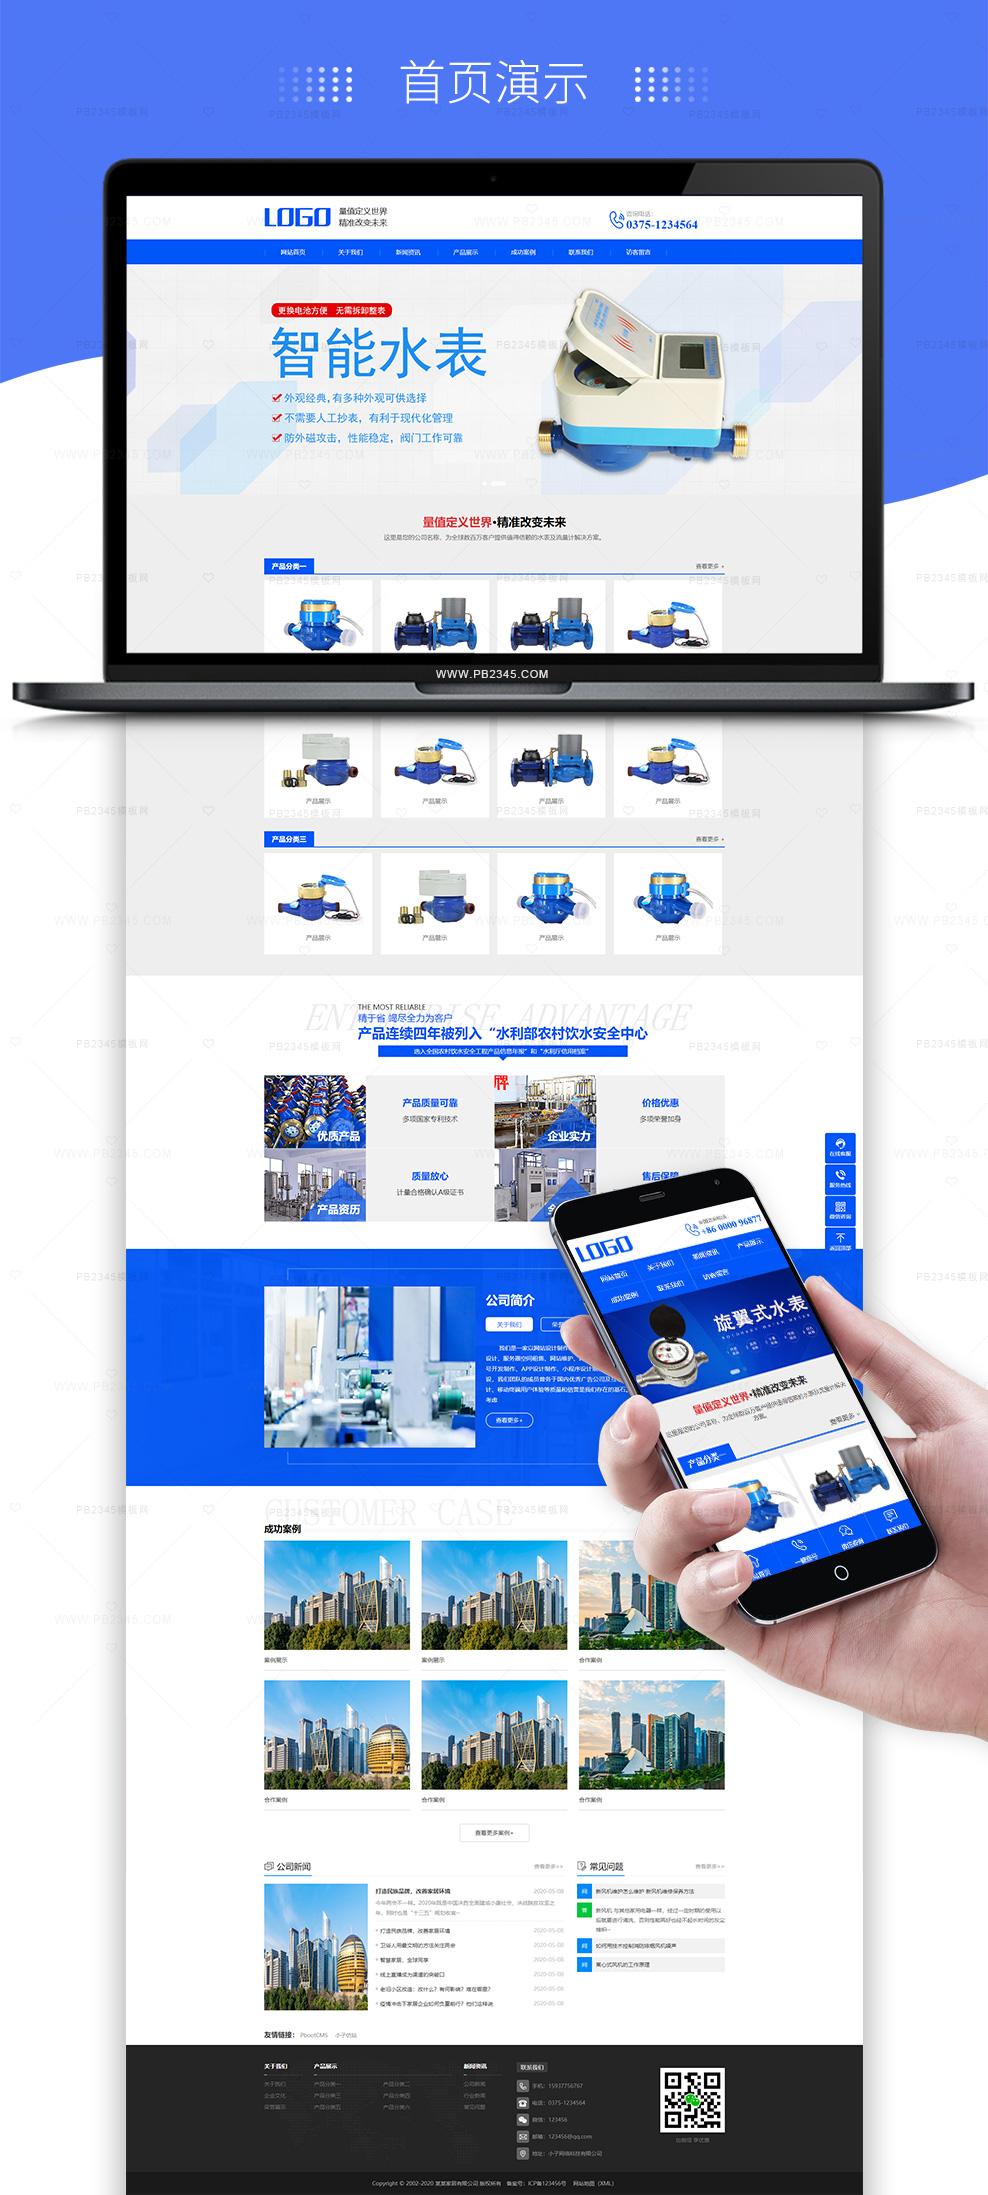 pbootcms自适应仪表设备类网站模板源码同步手机端